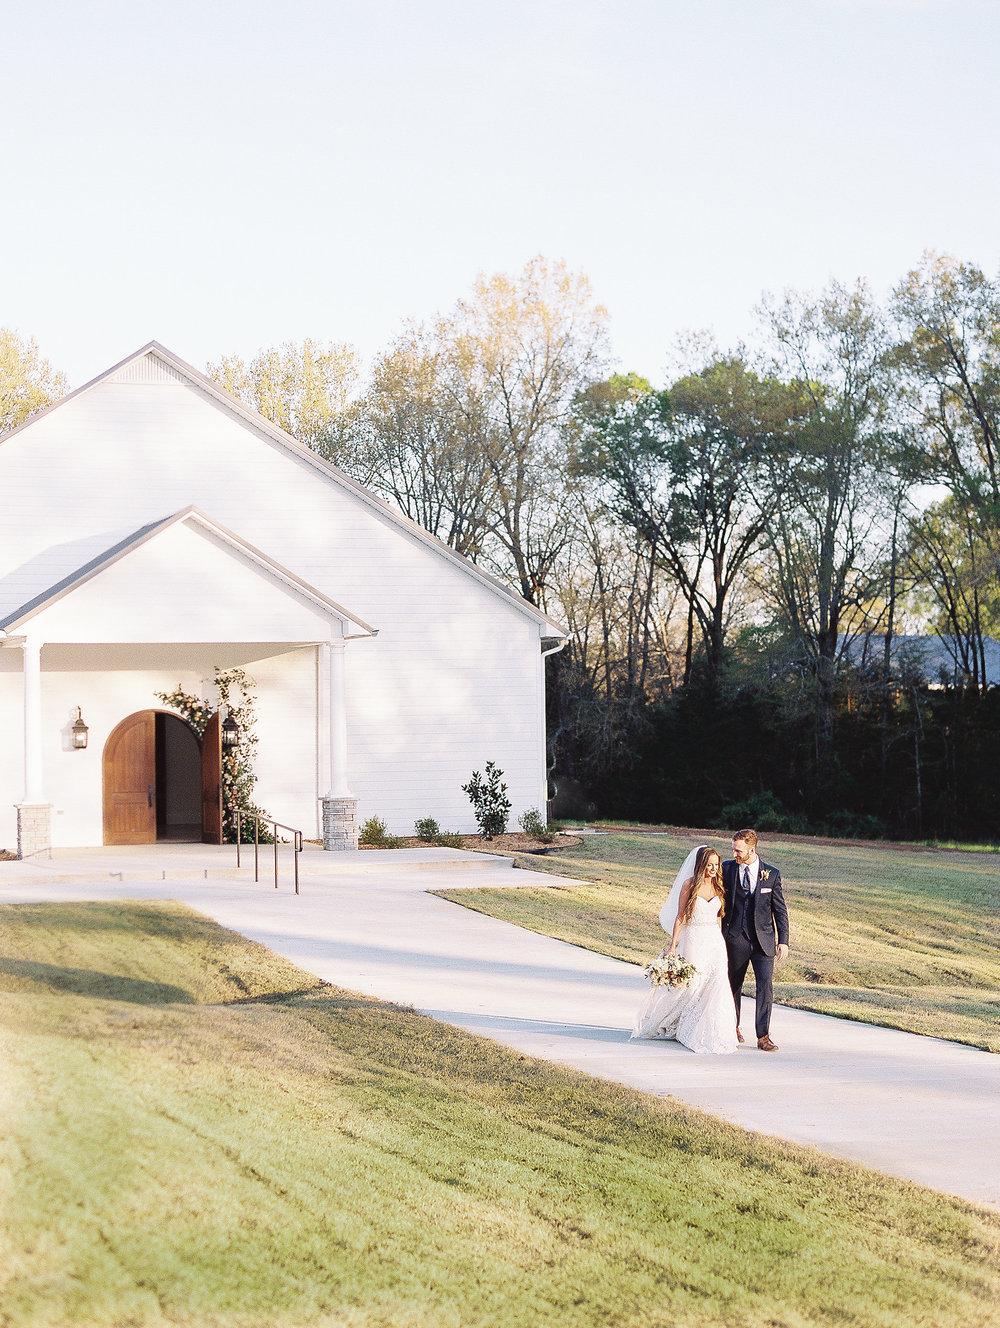 Jessica Zimmerman | Business Education Blog | Zimmerman Events Featured in Arkansas Bride Magazine